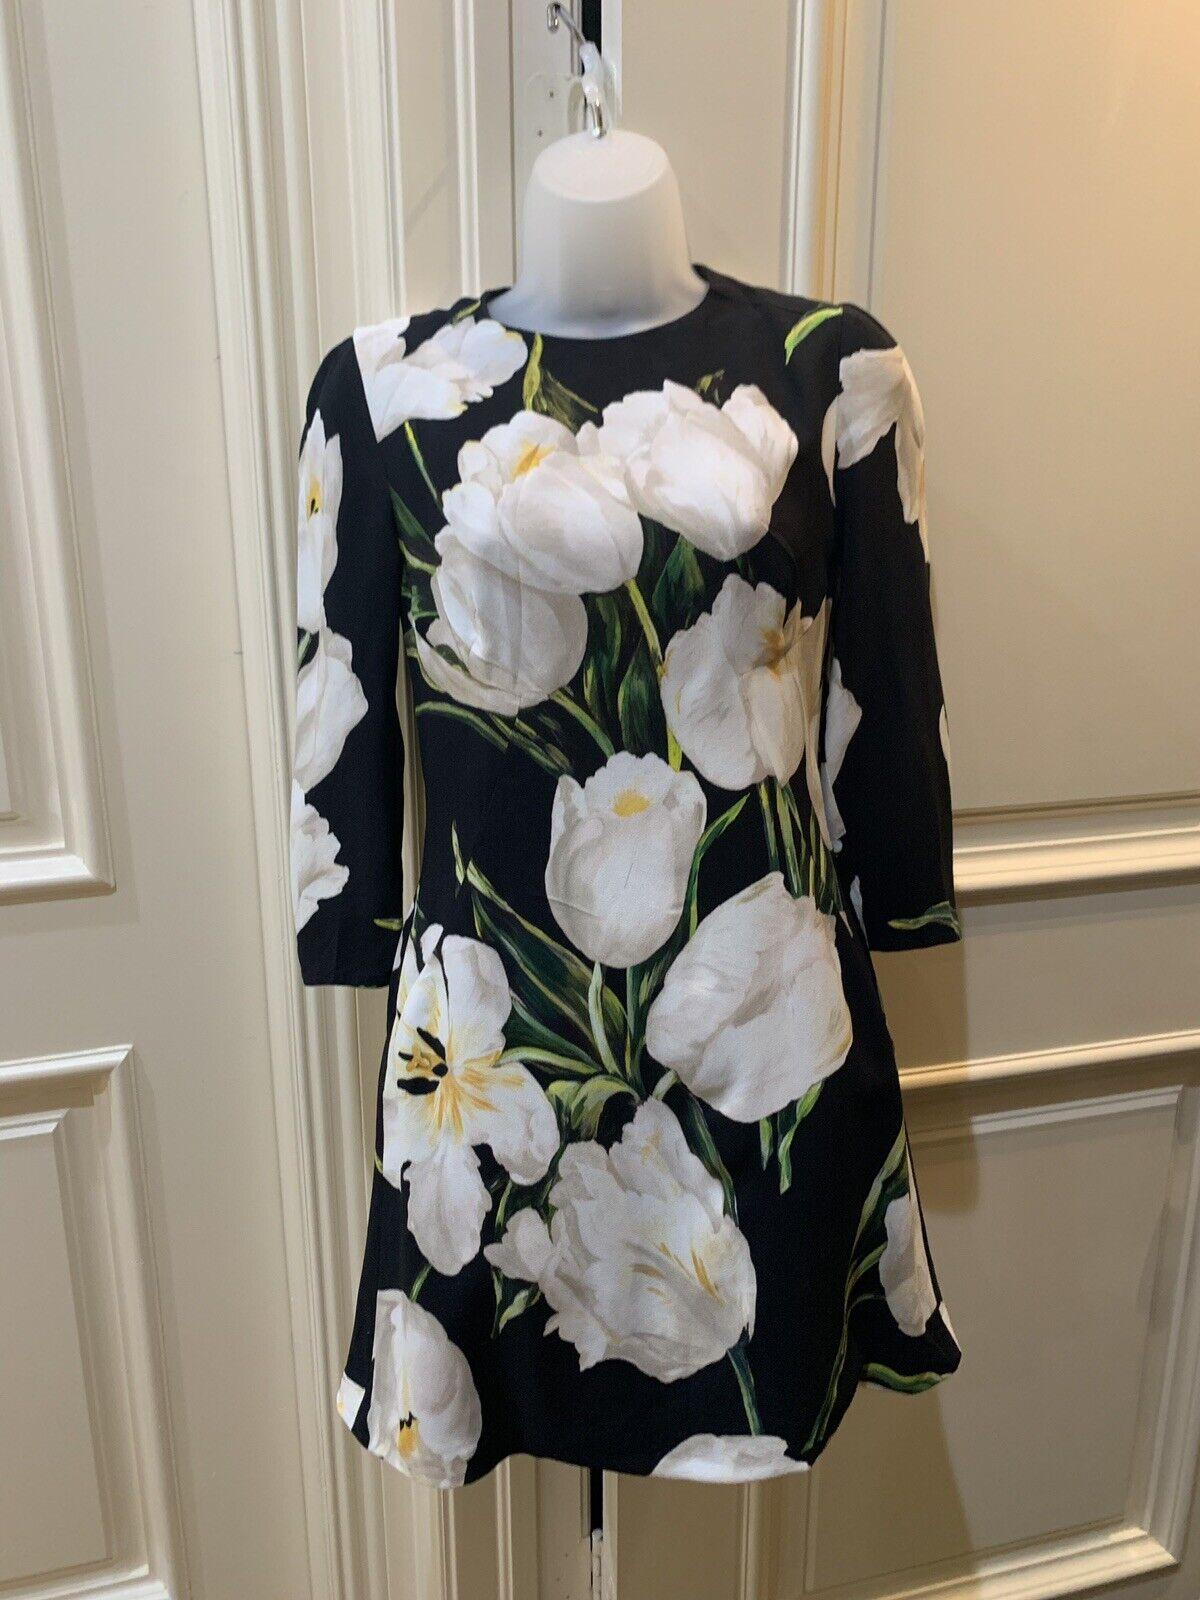 Dolce And Gabbana Tulip Print Dress 40 Italy - image 1